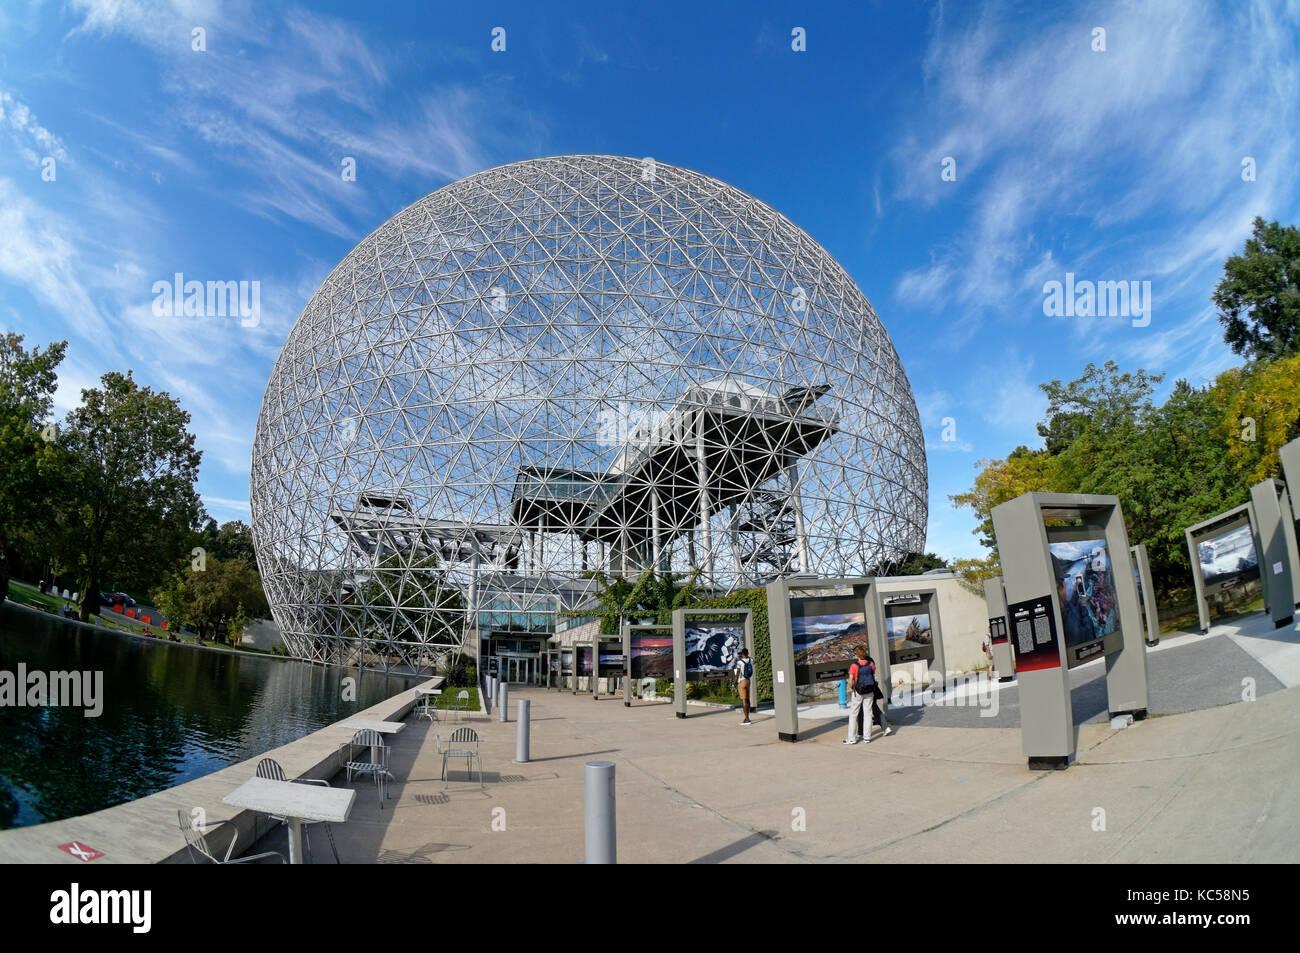 Tourists outside the Montreal Biosphere in Parc Jean Drapeau, Ile Sainte-Helene, Montreal, Quebec, Canada - Stock Image